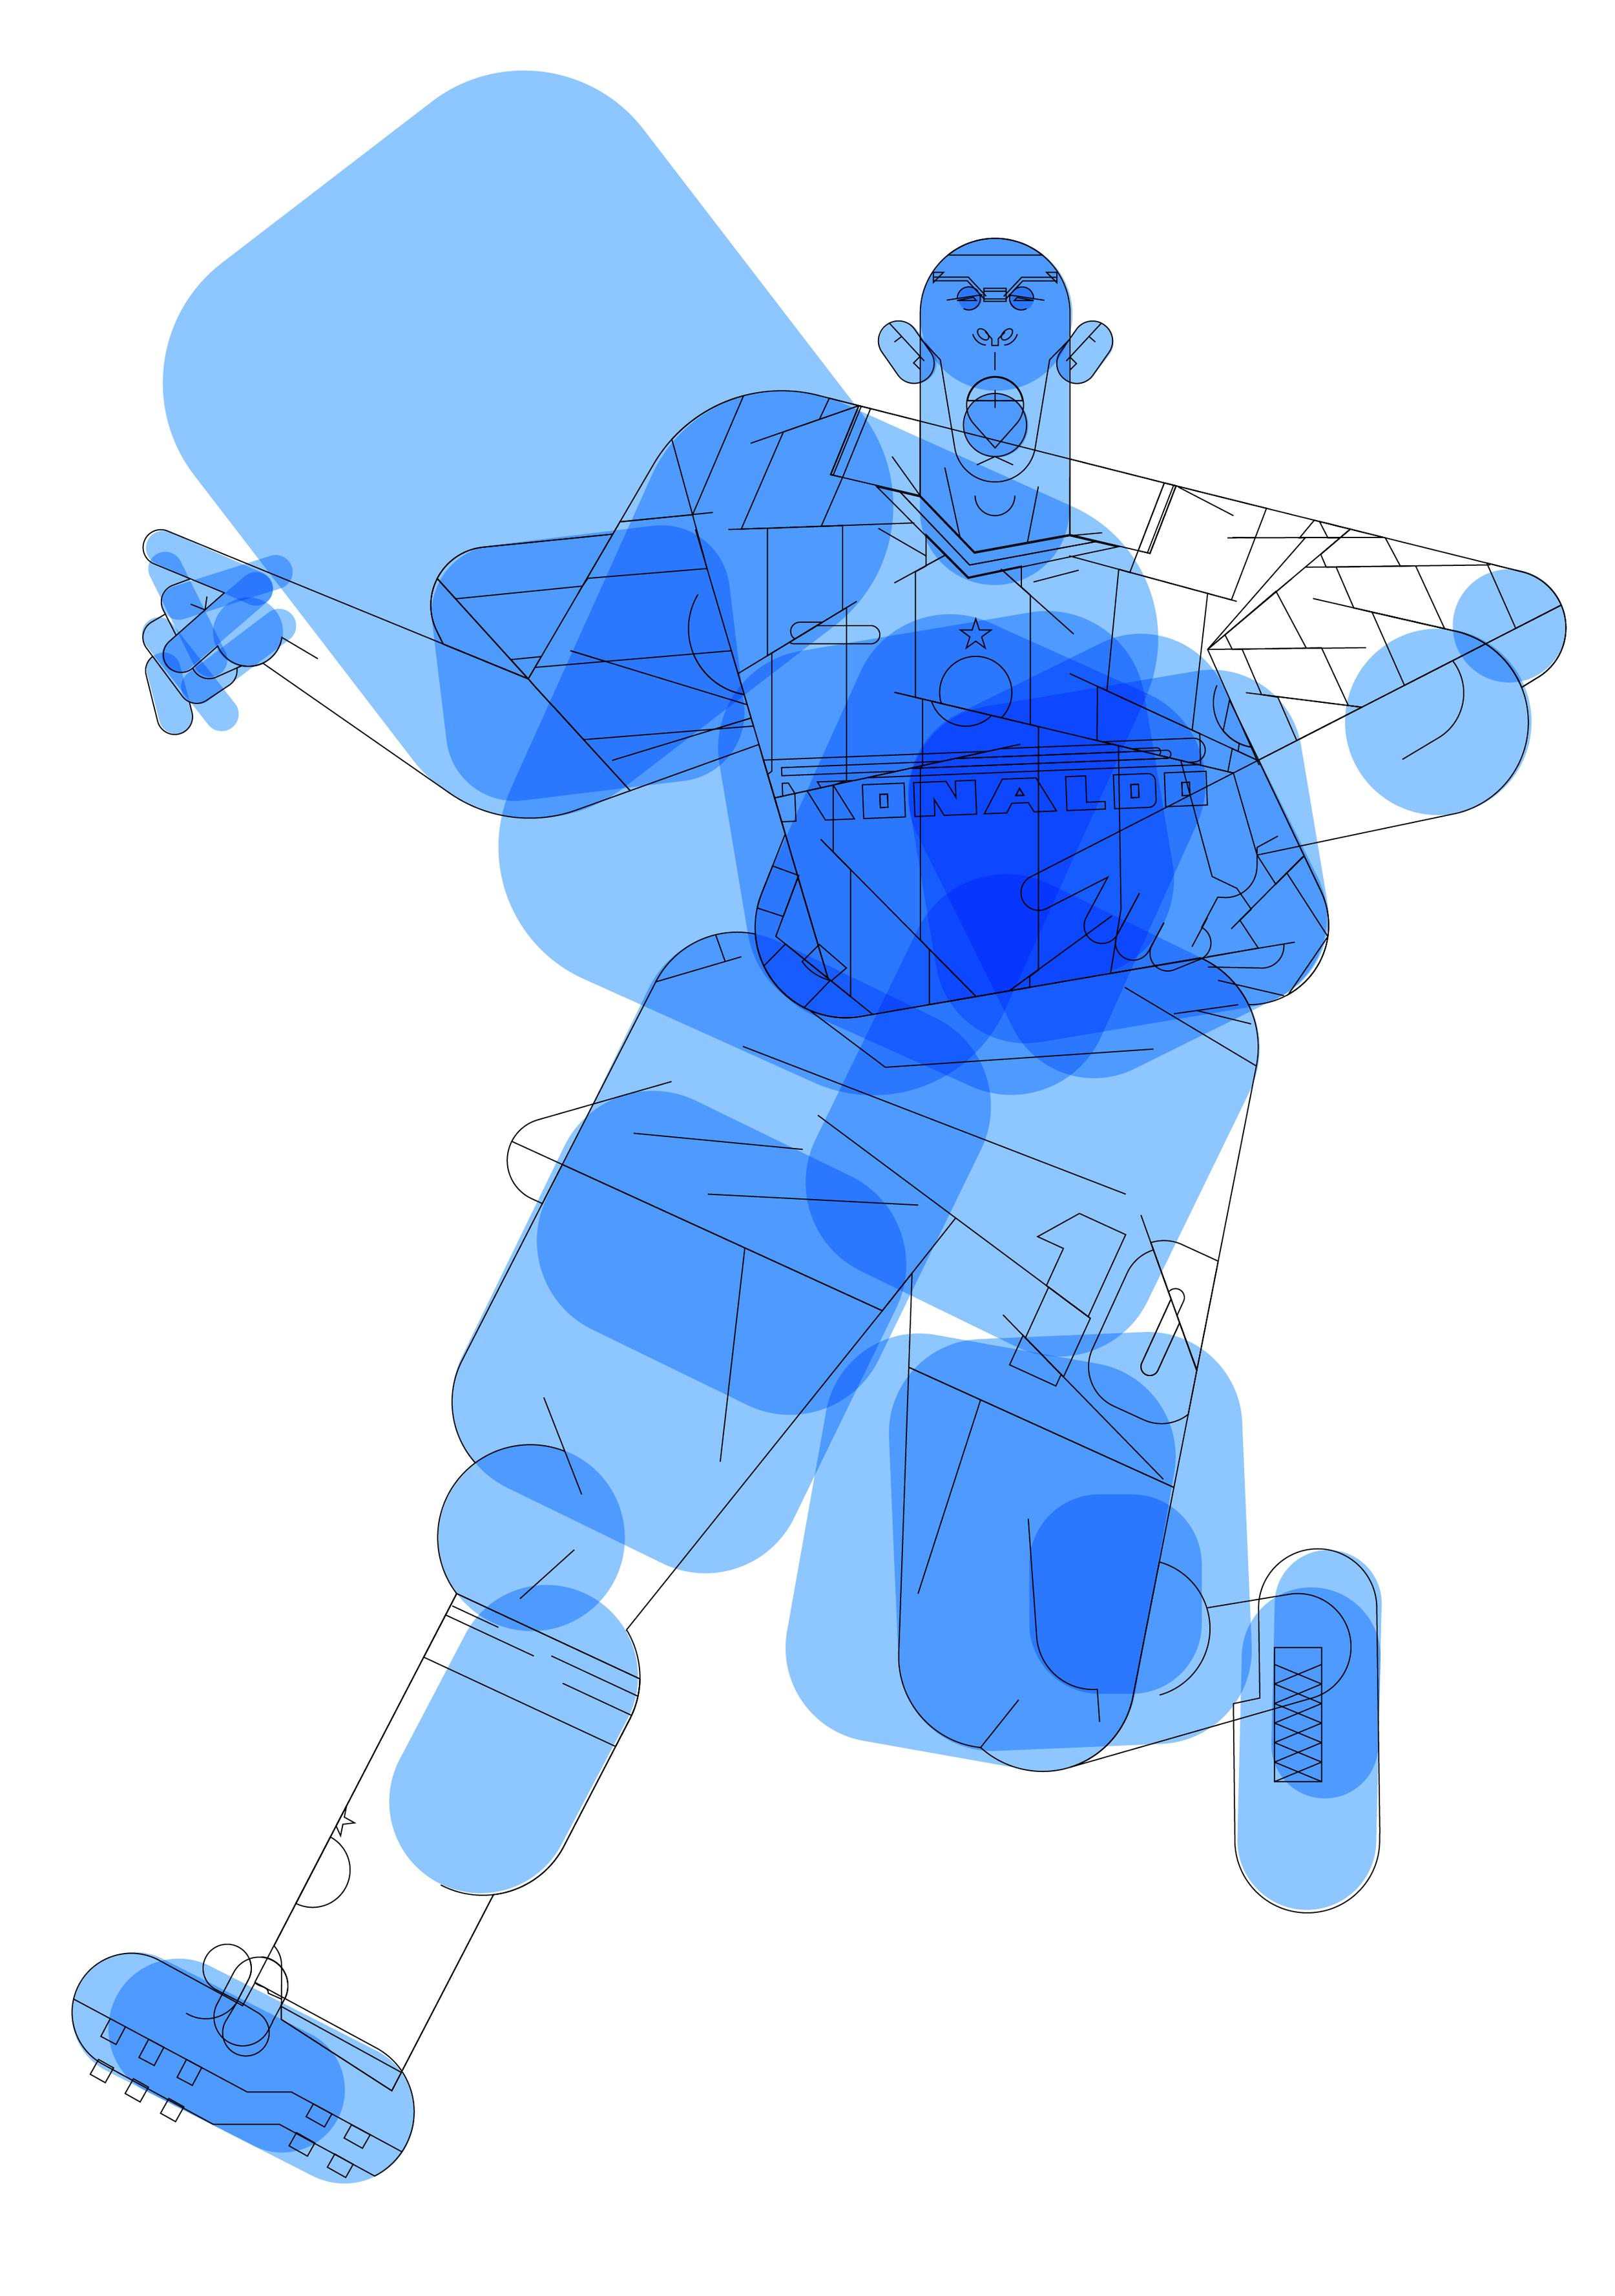 Football Players_Ronaldo 9 studies_wireframes.png